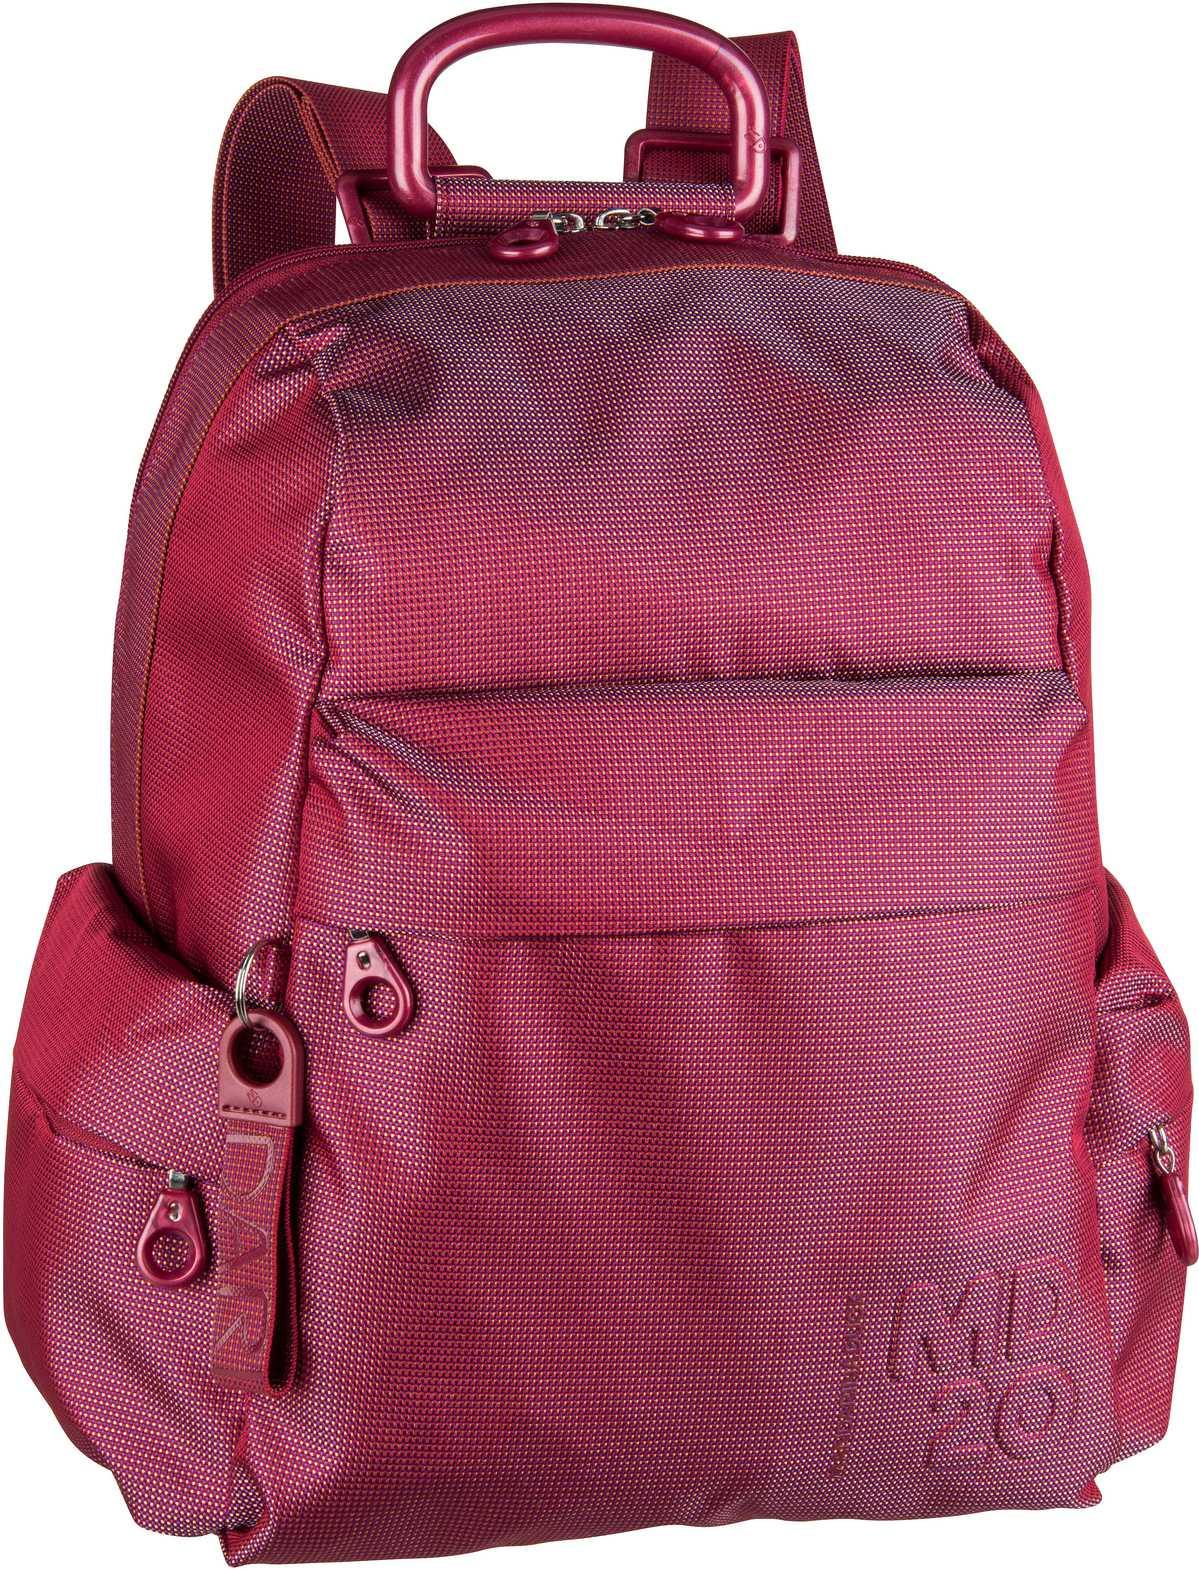 Rucksack / Daypack MD20 Medium Backpack QMTT2 Bouganville